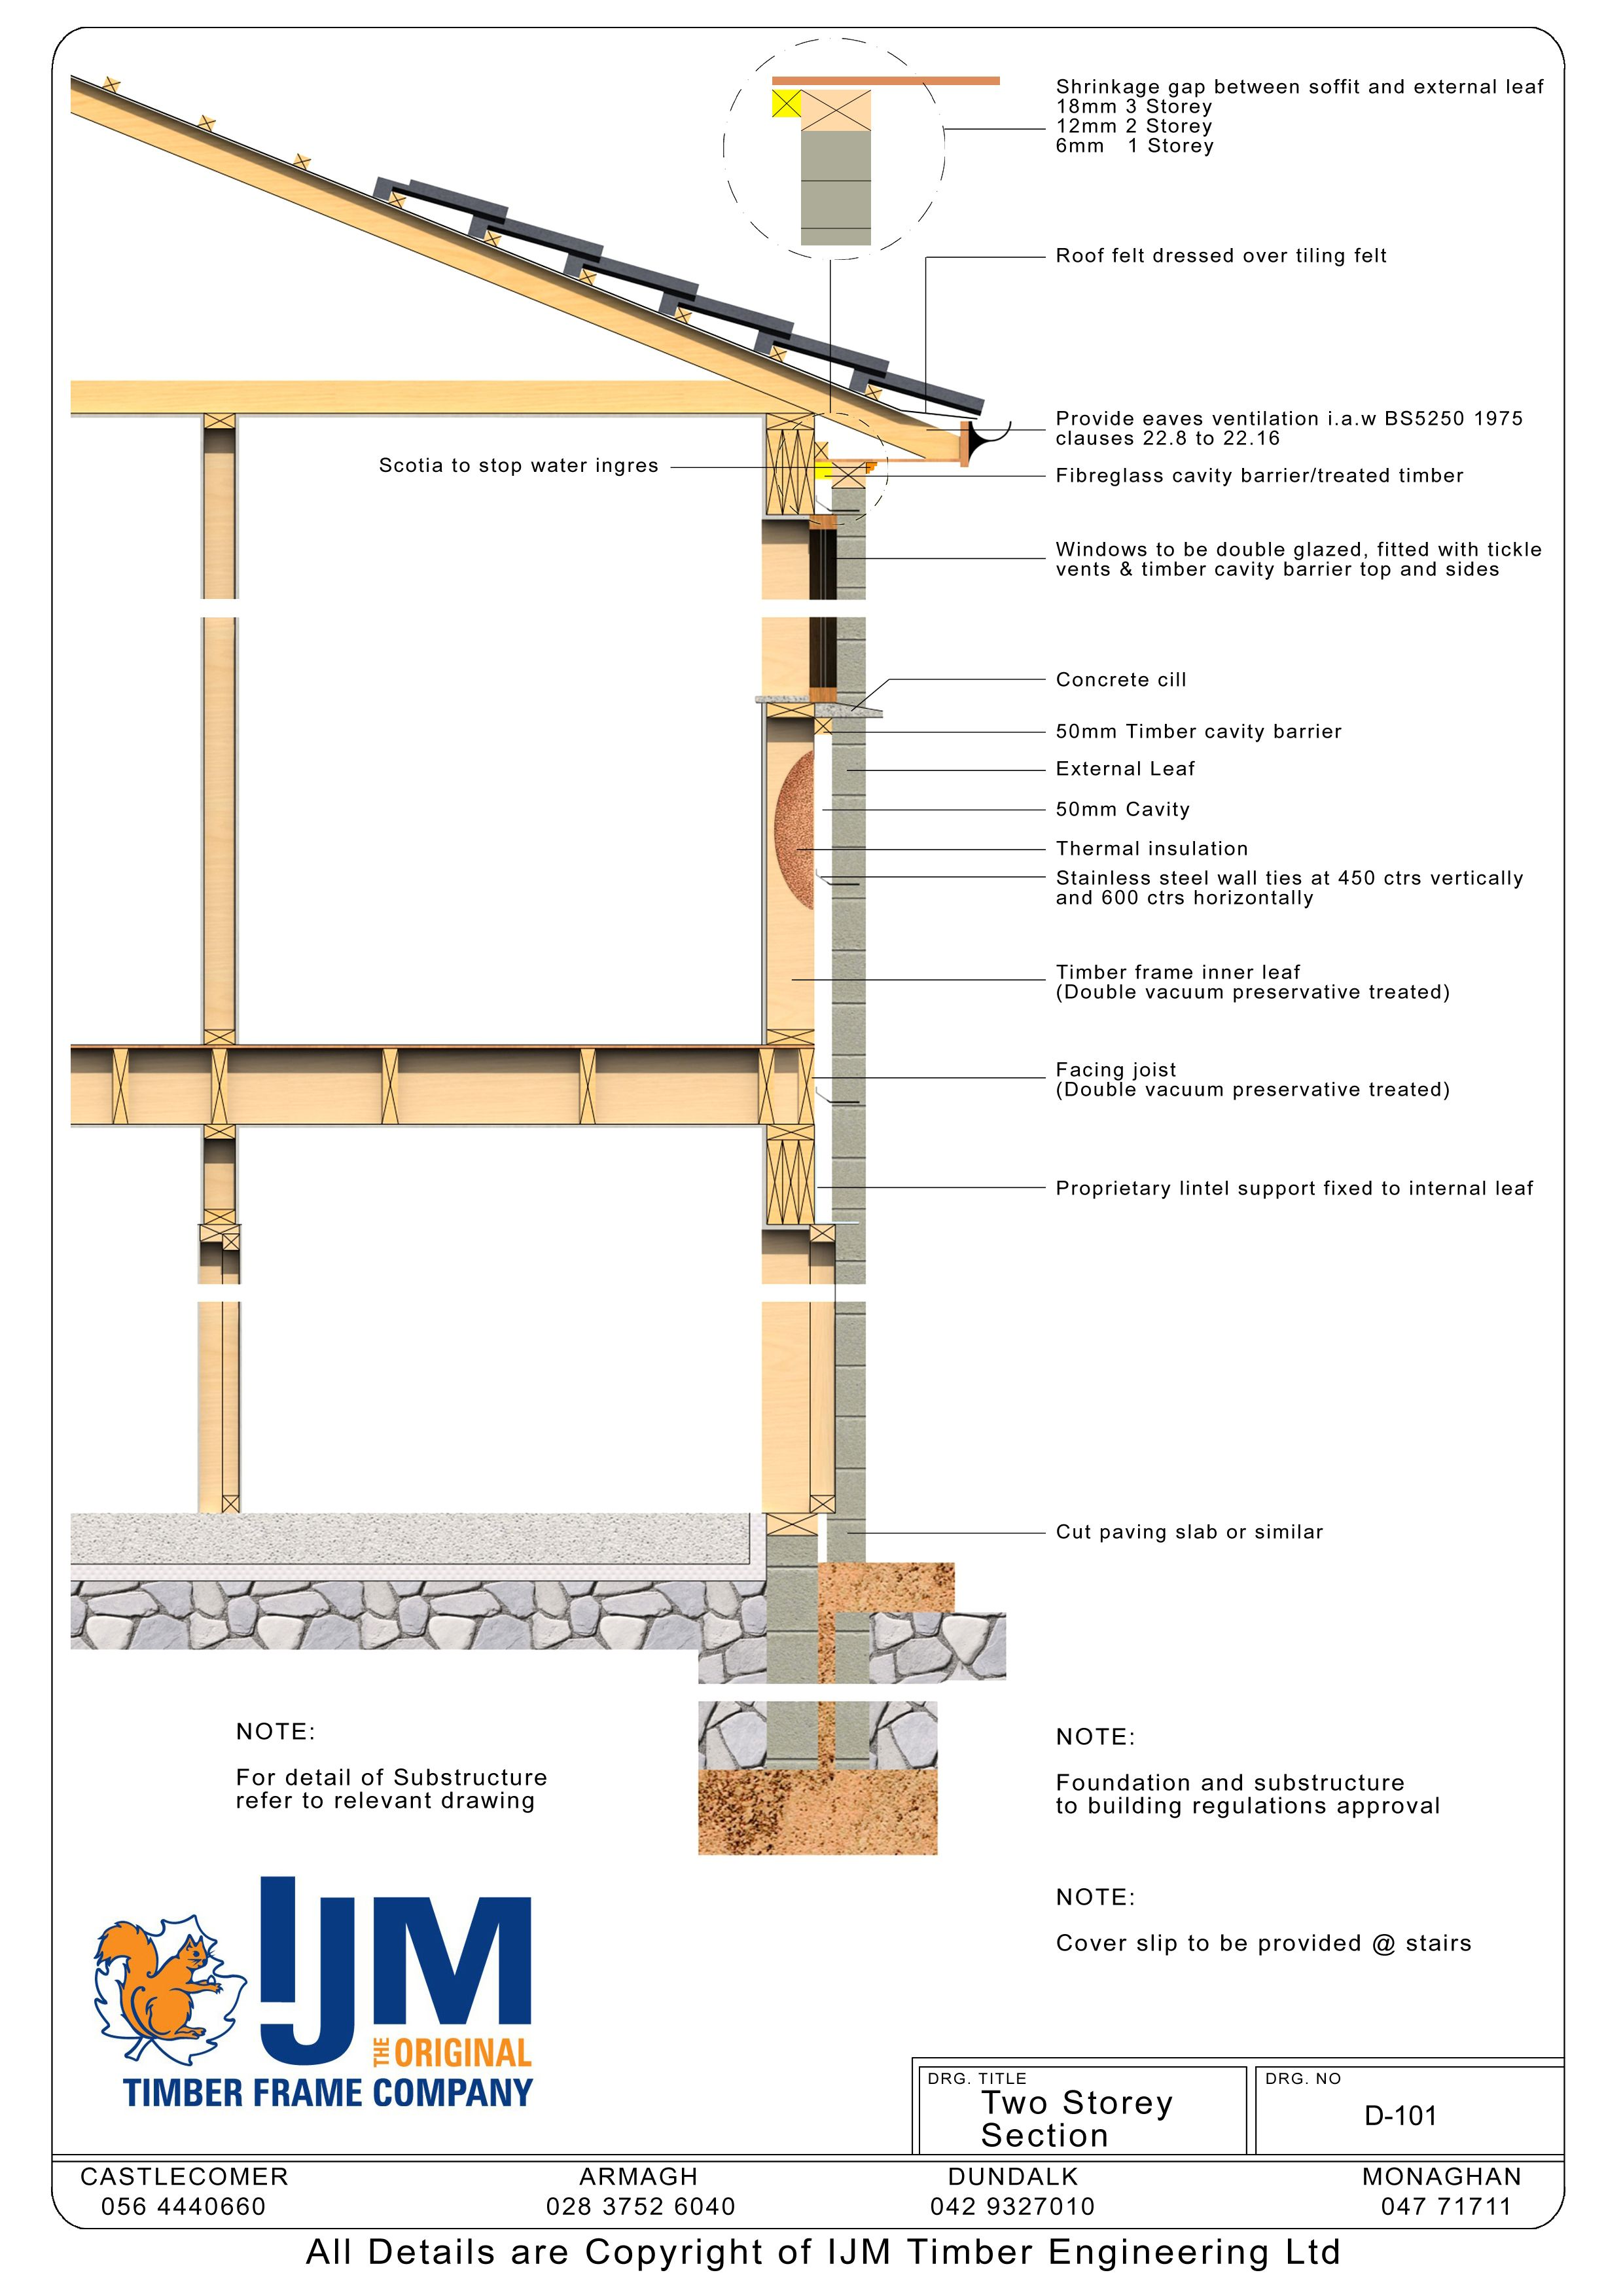 Ijm Timberframe Technical Details Book Of Details Chapter 3 En 2020 Detalles Constructivos Constructivo Arquitectura